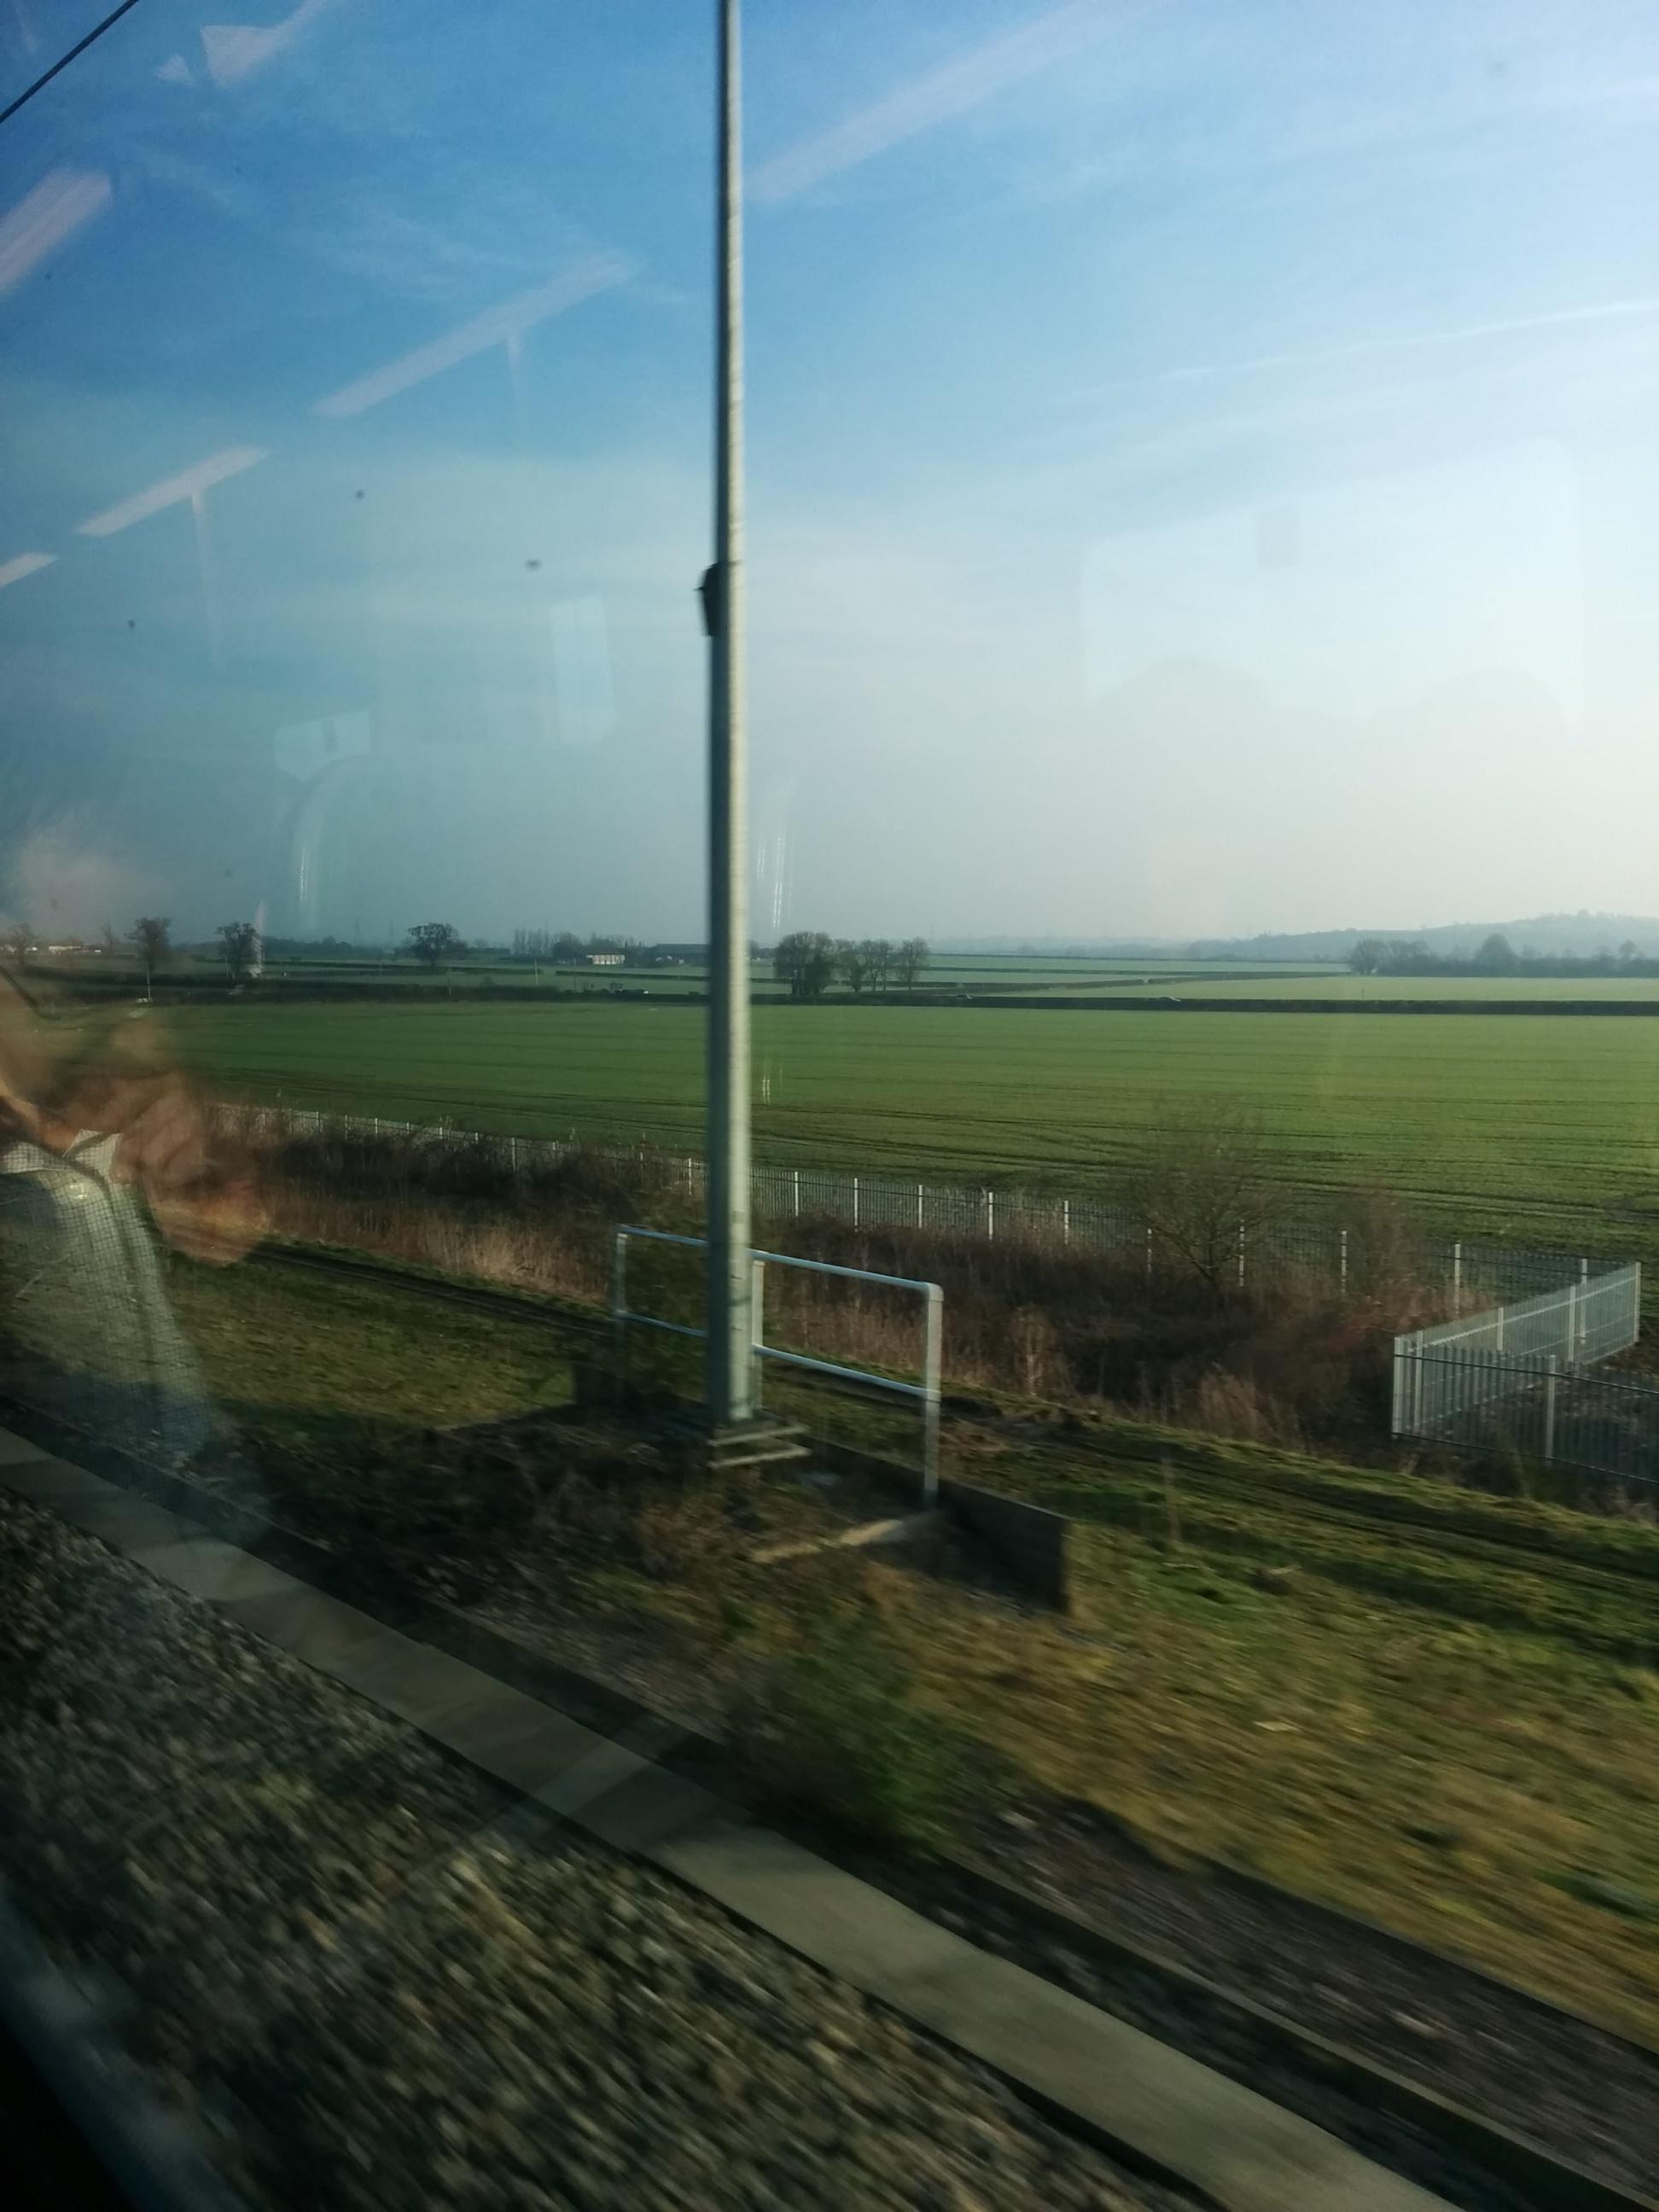 London Midland commuter view